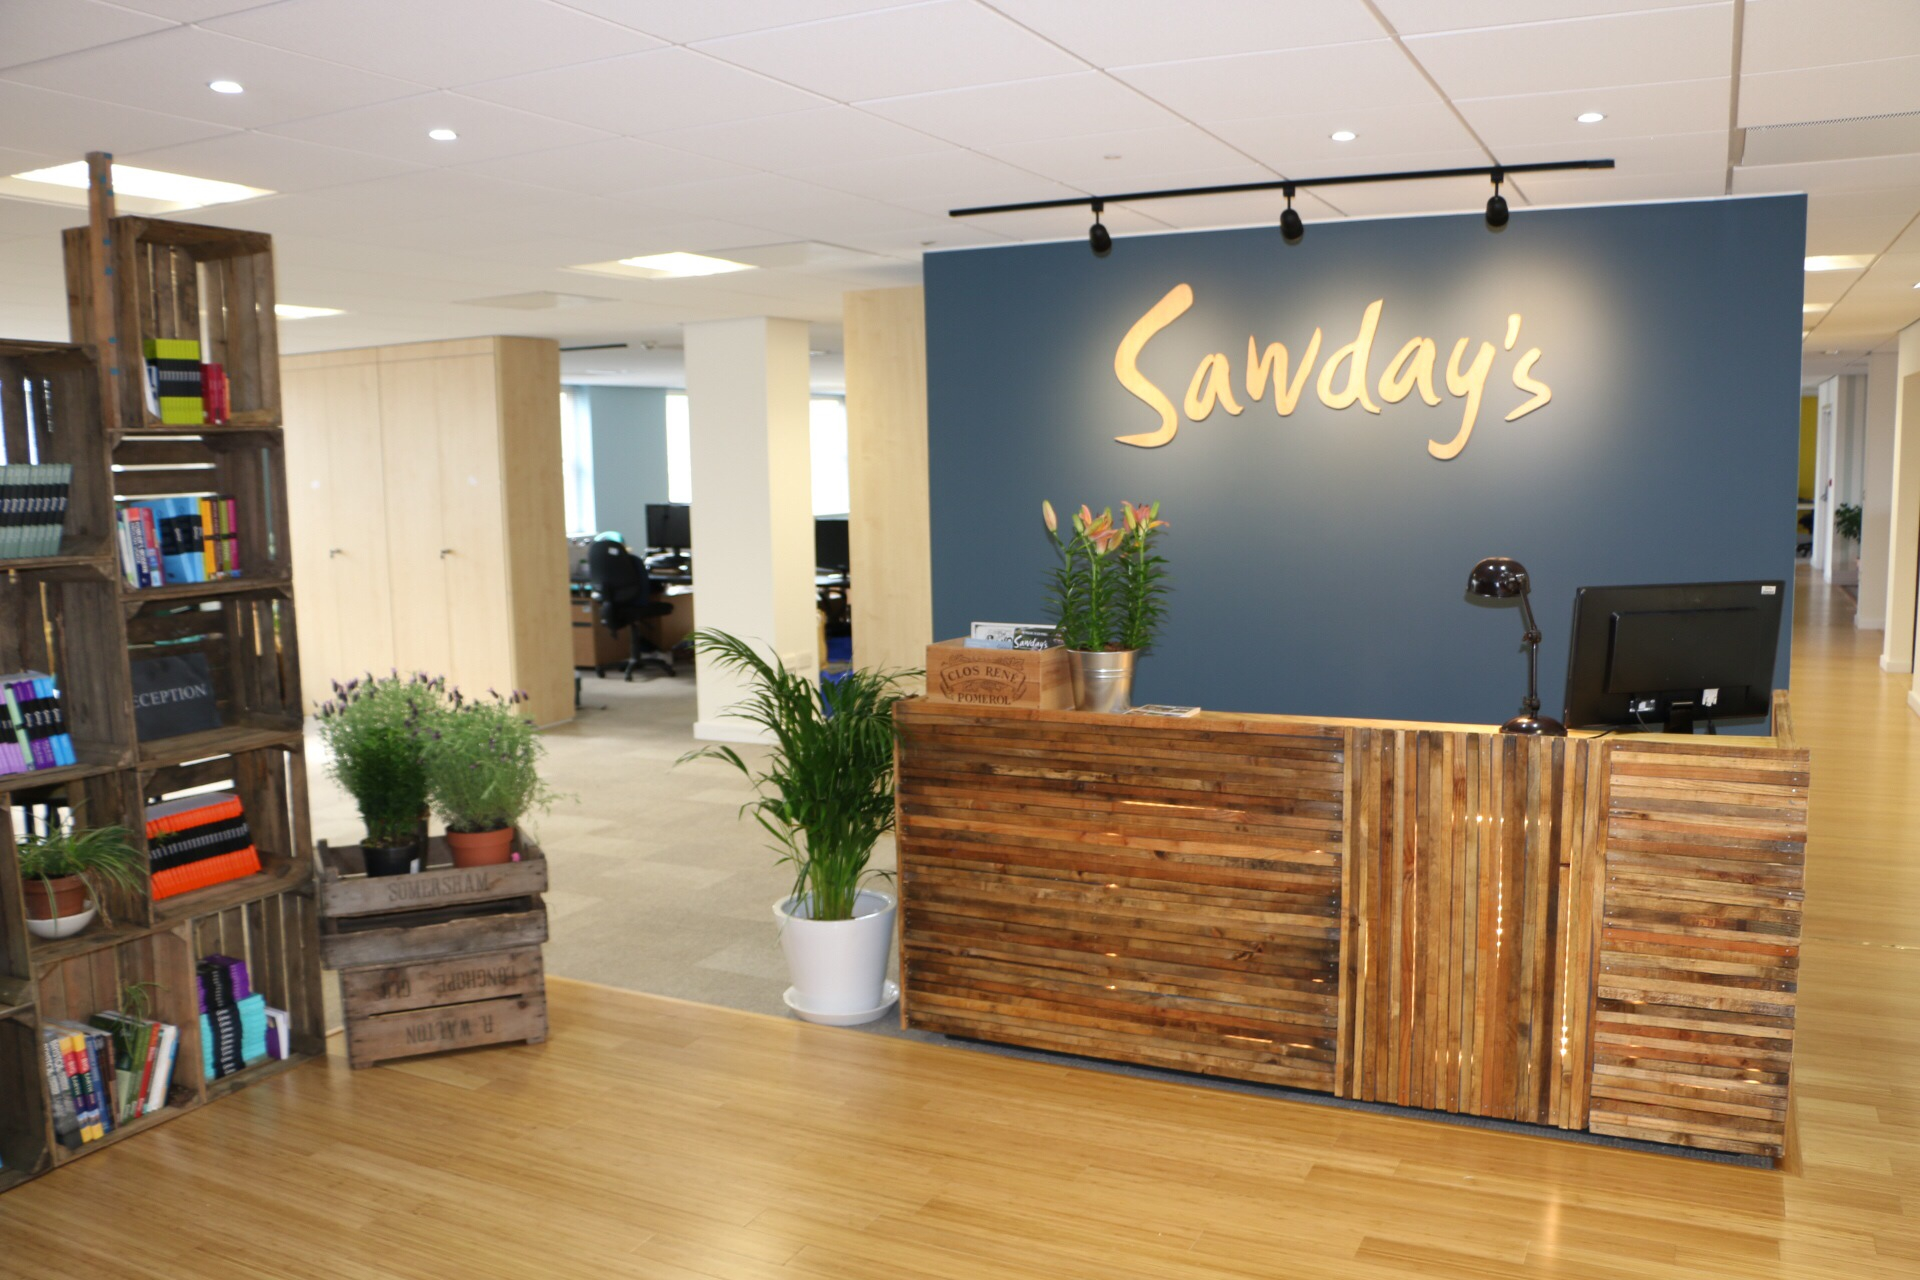 Sawdays_offices.jpg